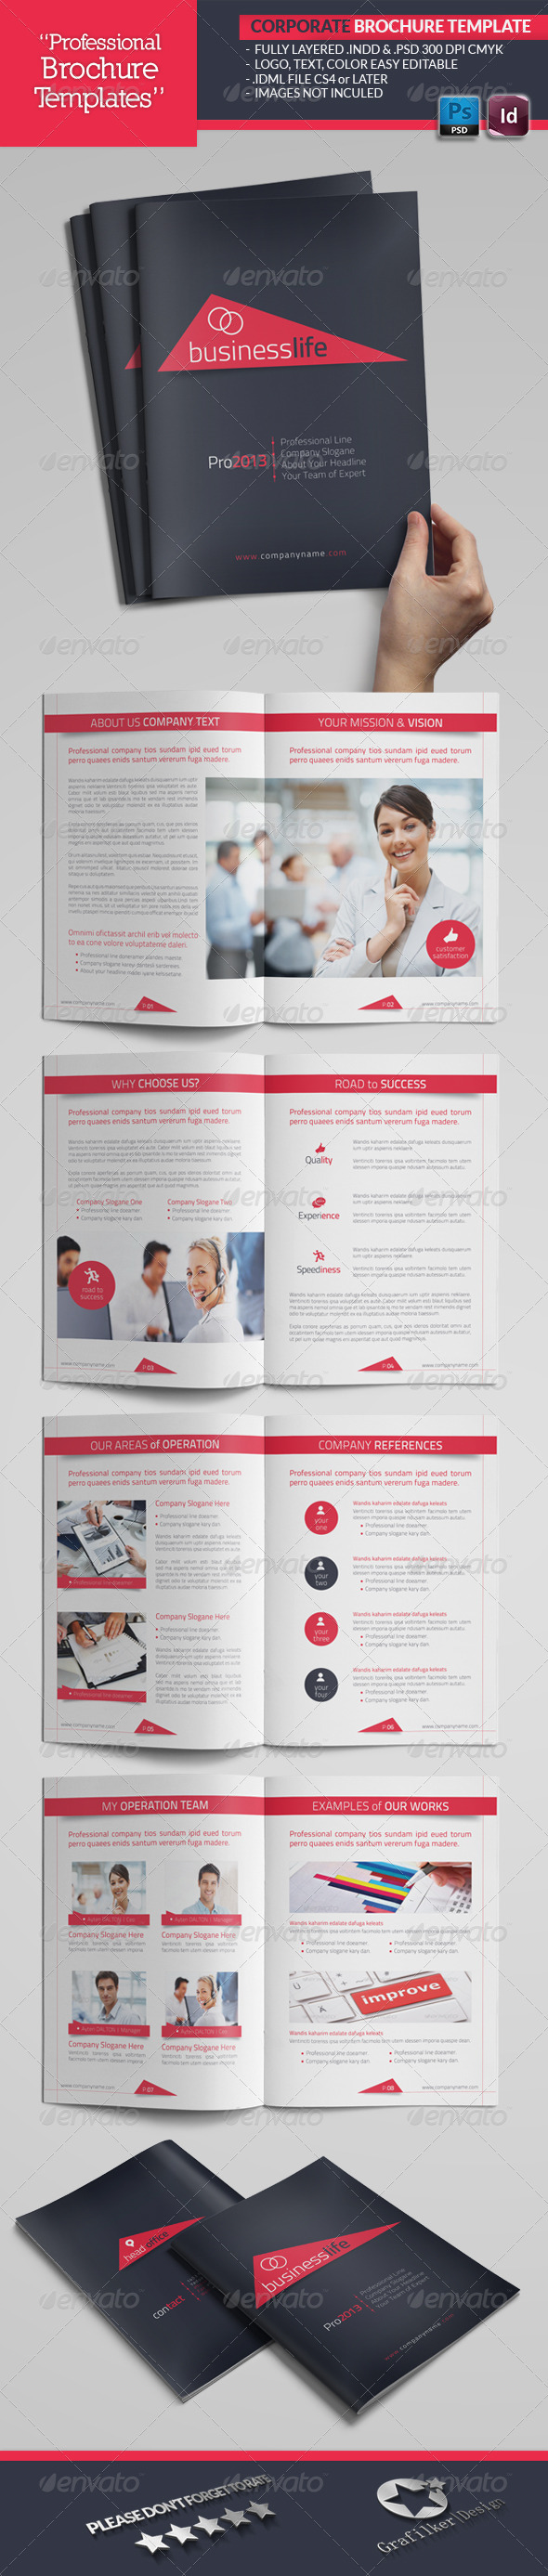 GraphicRiver Corporate Catalogue Template 4529251